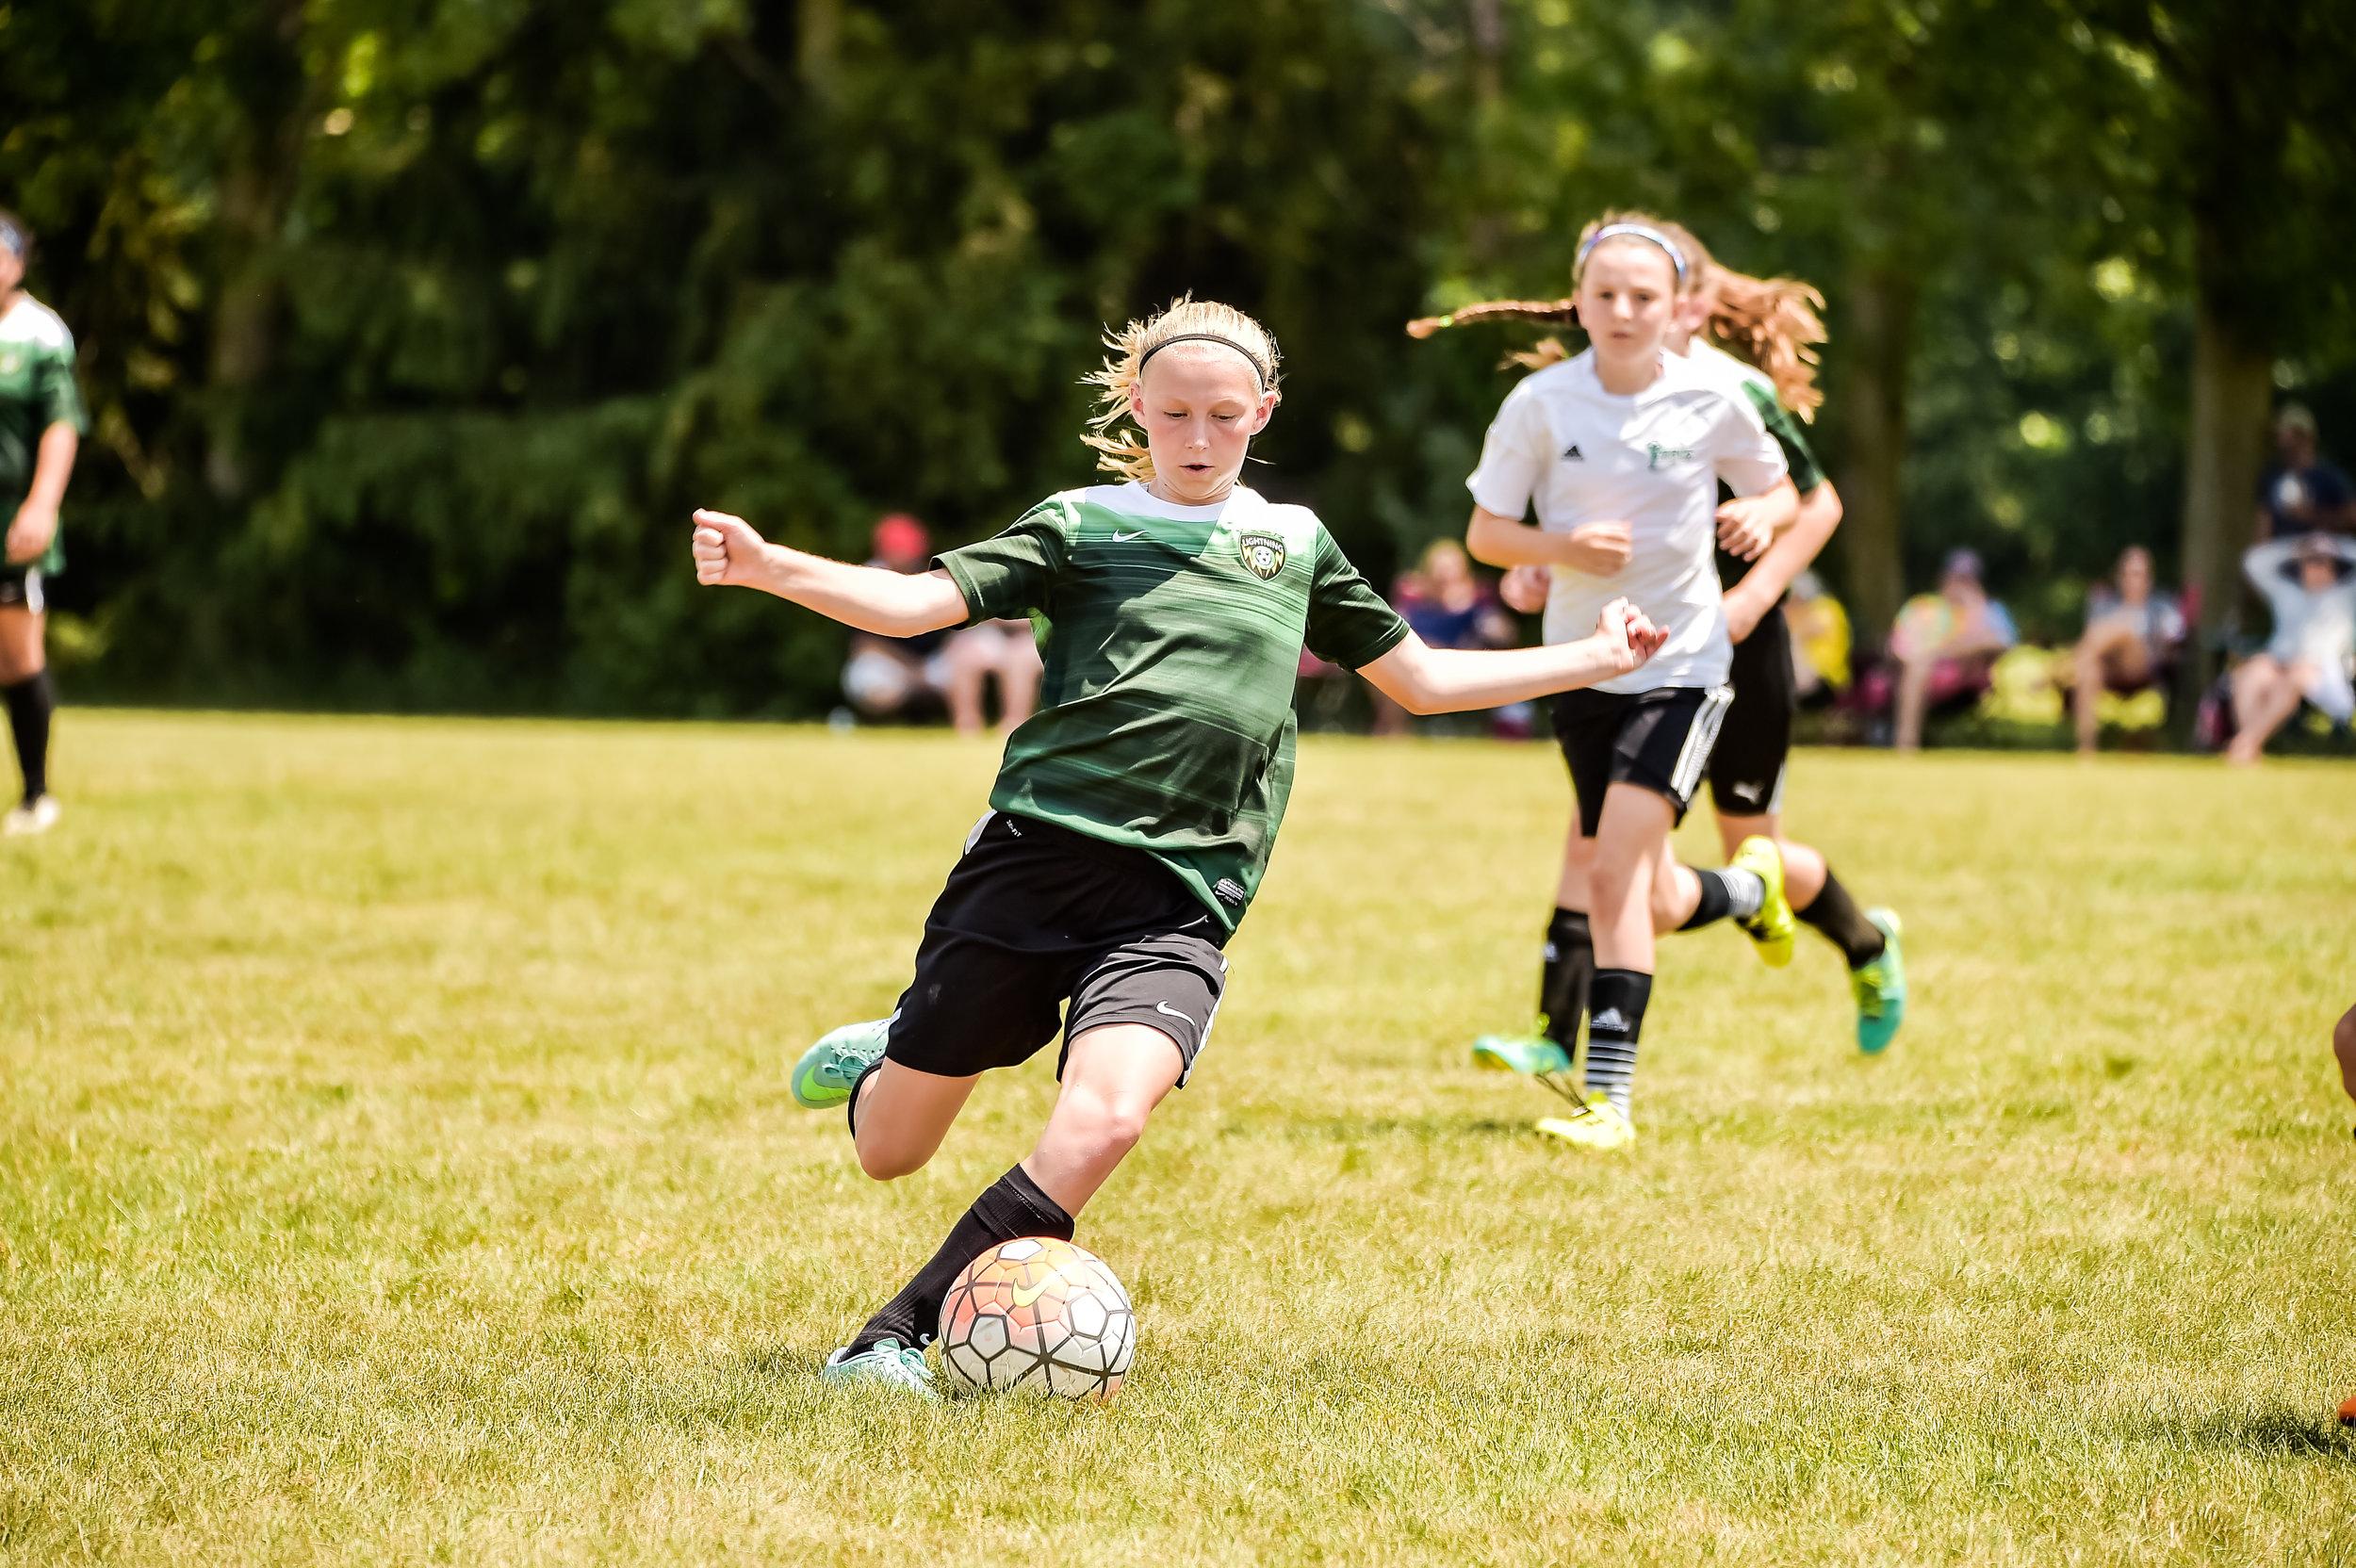 June 11, 2017 - PSC U13 Girls White - Tournament Game-21.jpg